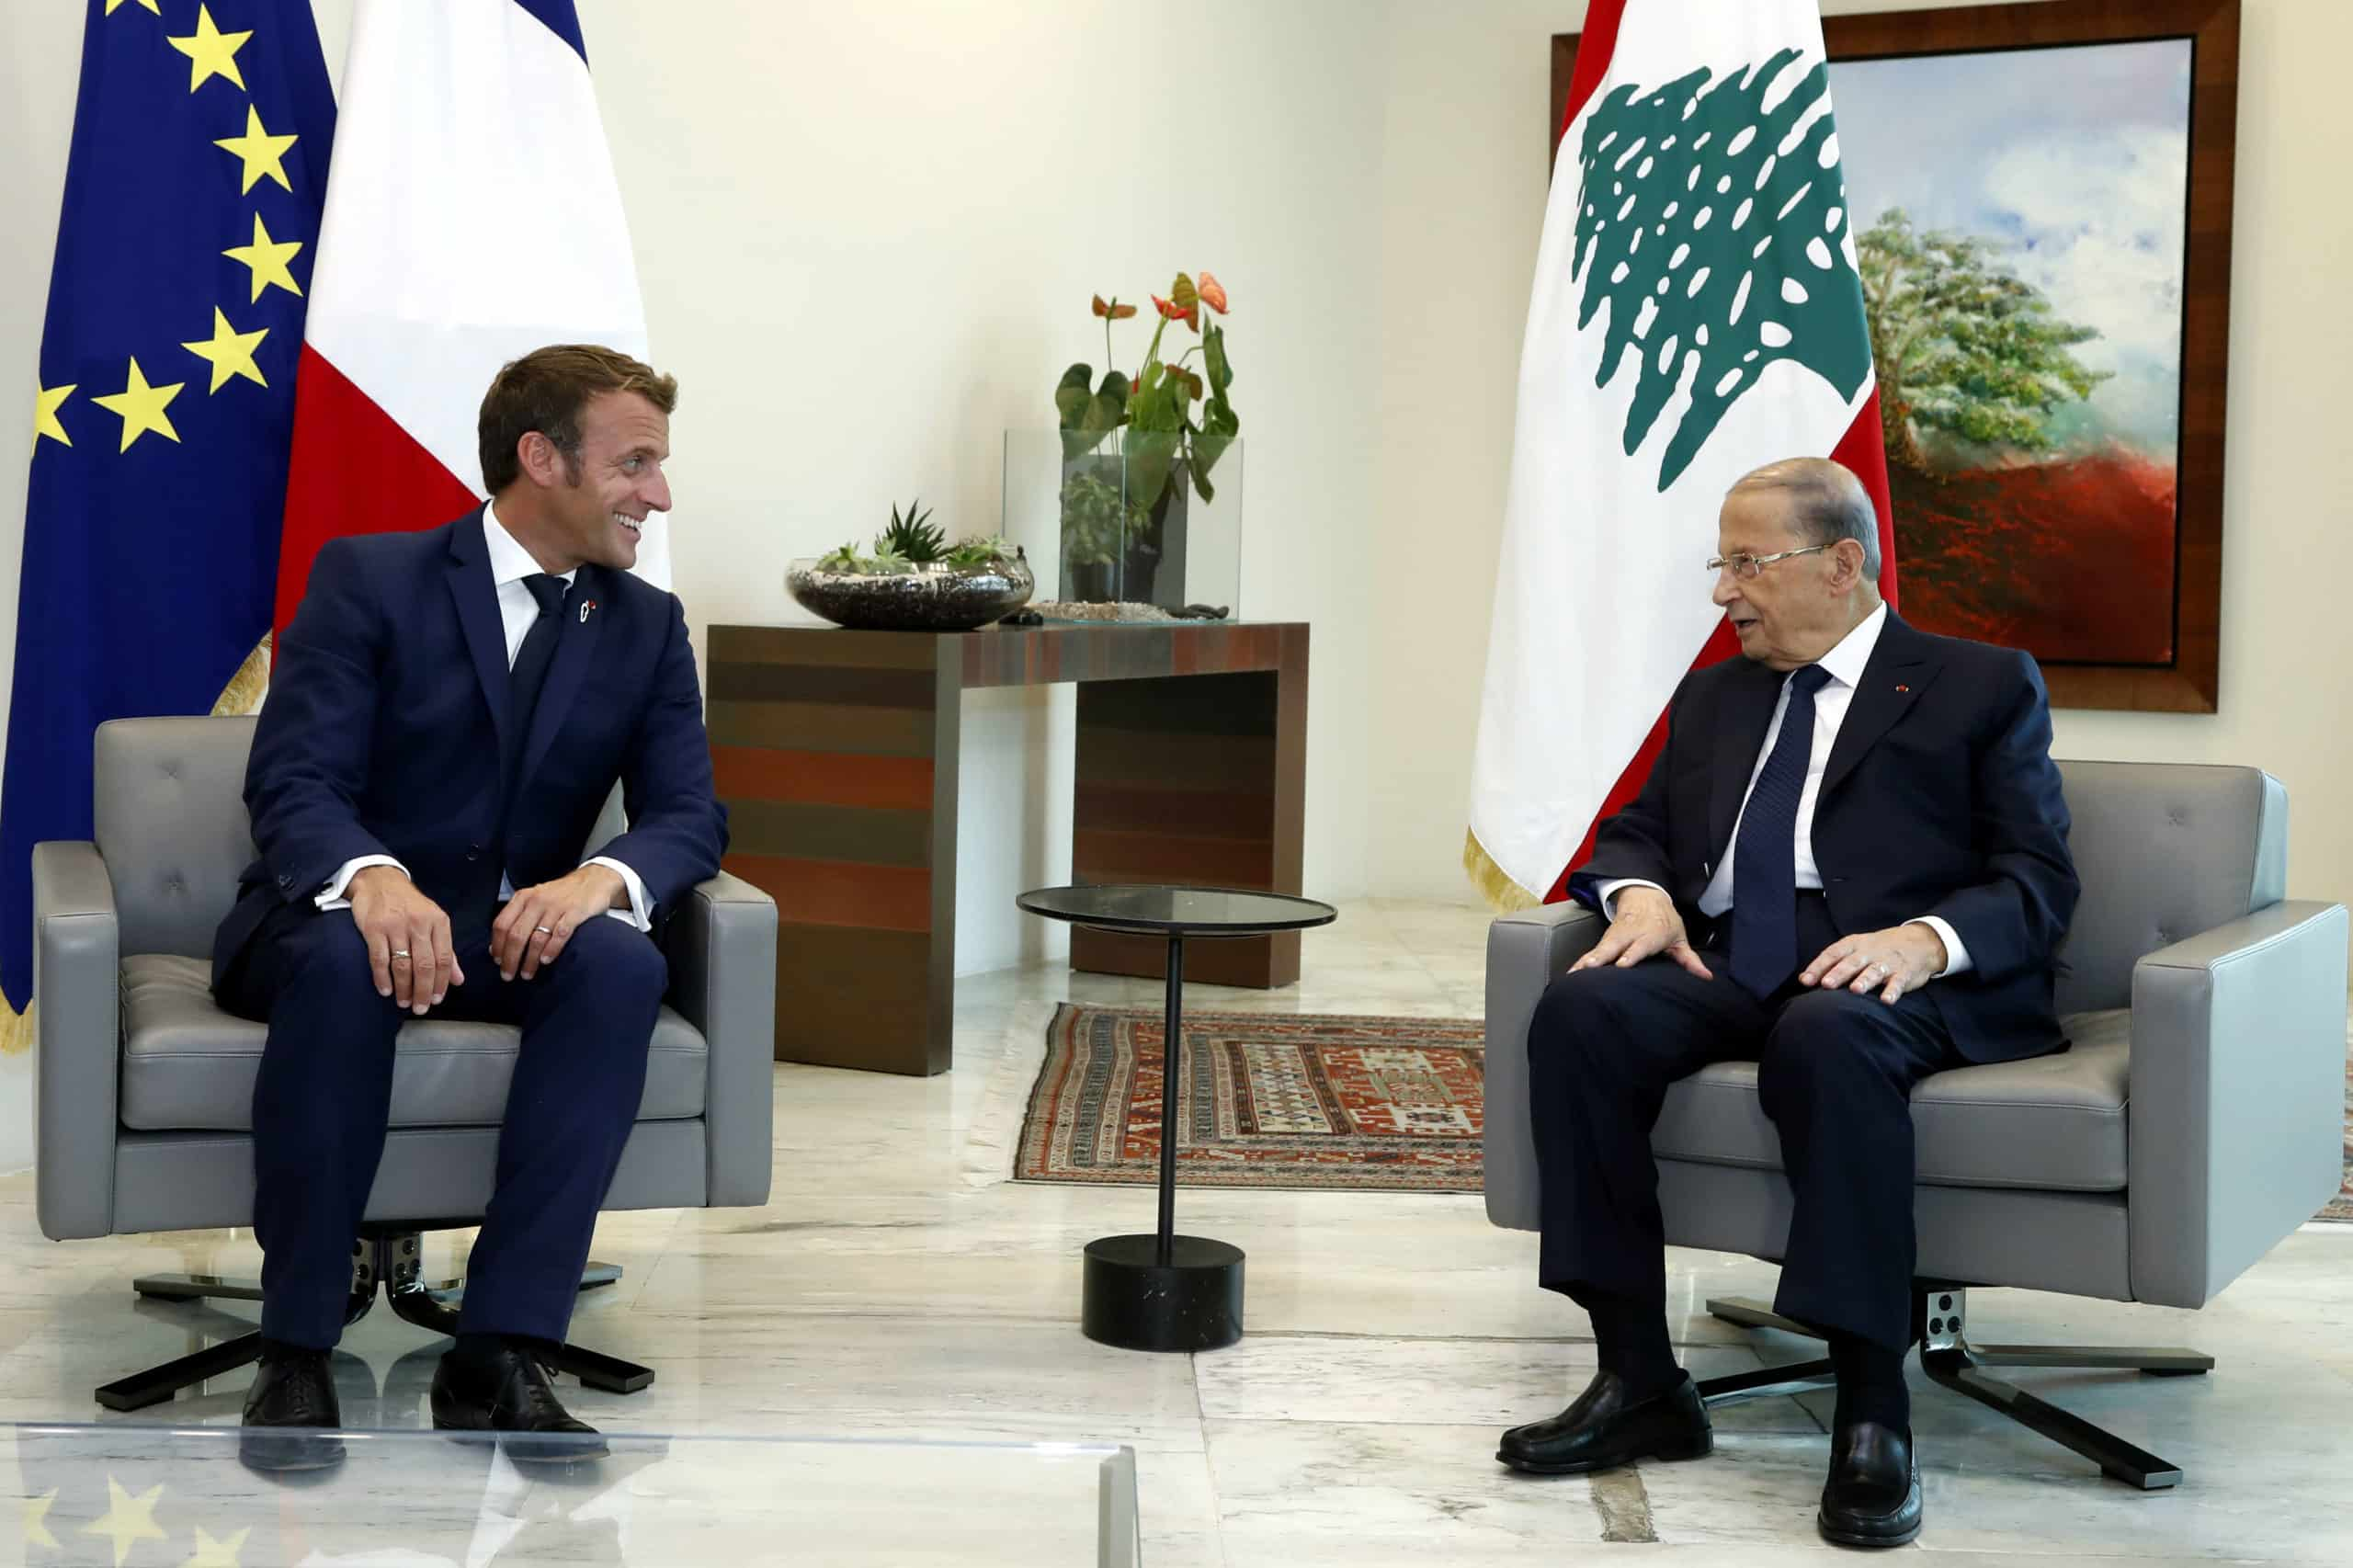 Dalati Aoun Macron Scaled